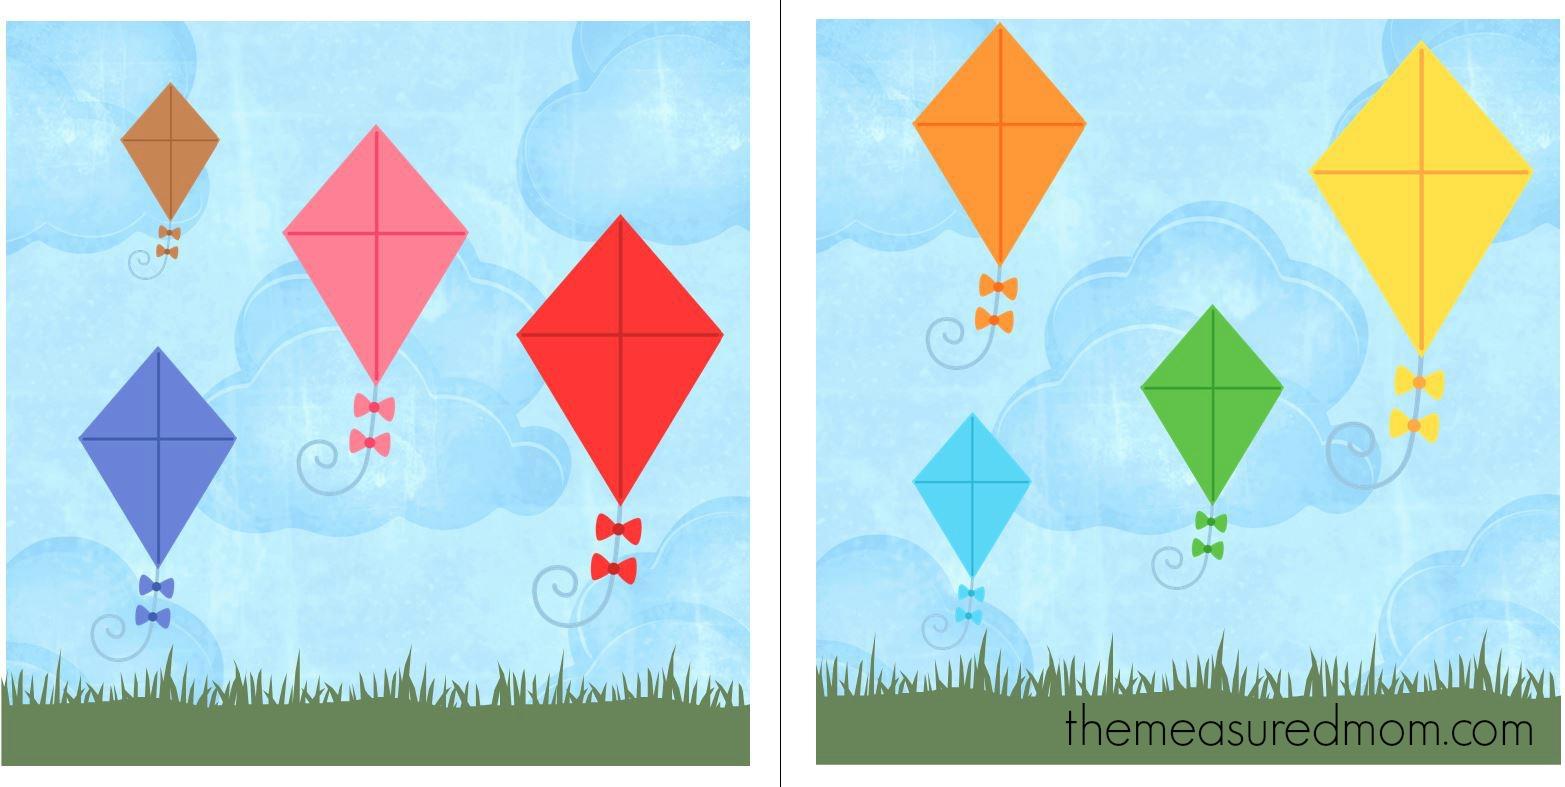 Free File Folder Game For Preschoolers: Kites! - The Measured Mom - Free Printable File Folder Games For Preschool